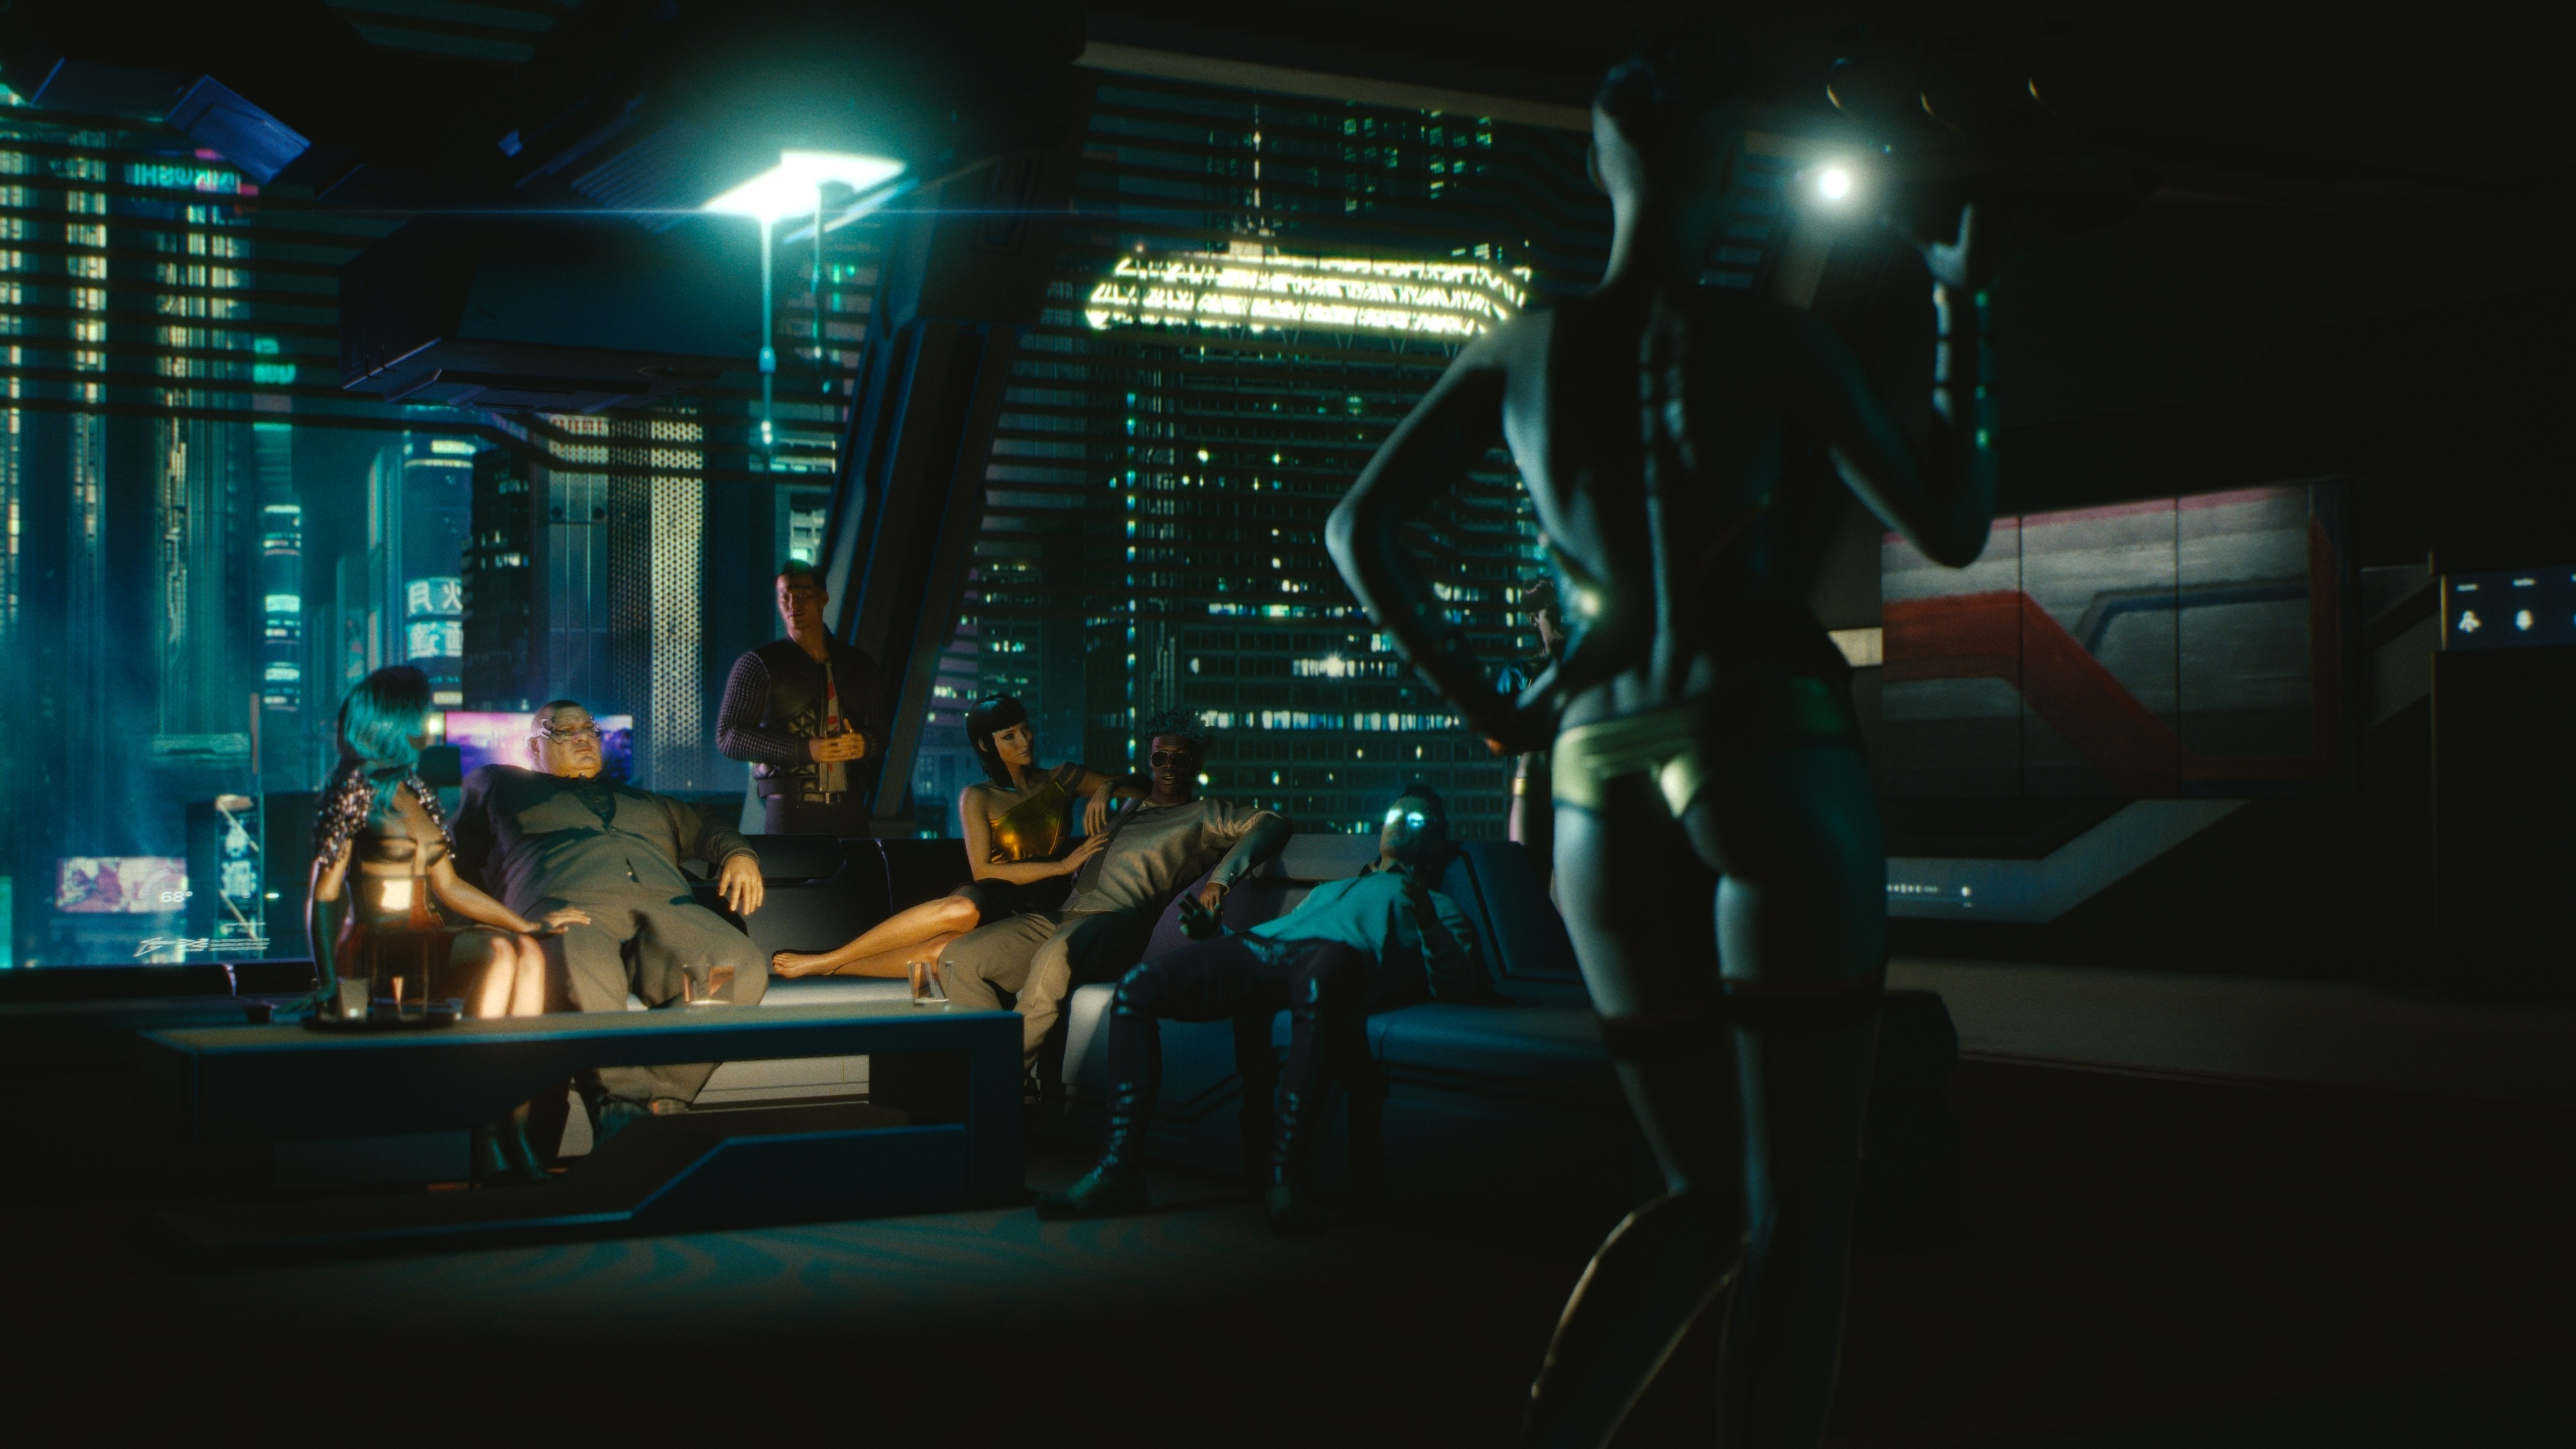 Cyberpunk 2077 4k Ultra Fond Décran Hd Arrière Plan 3840x2160